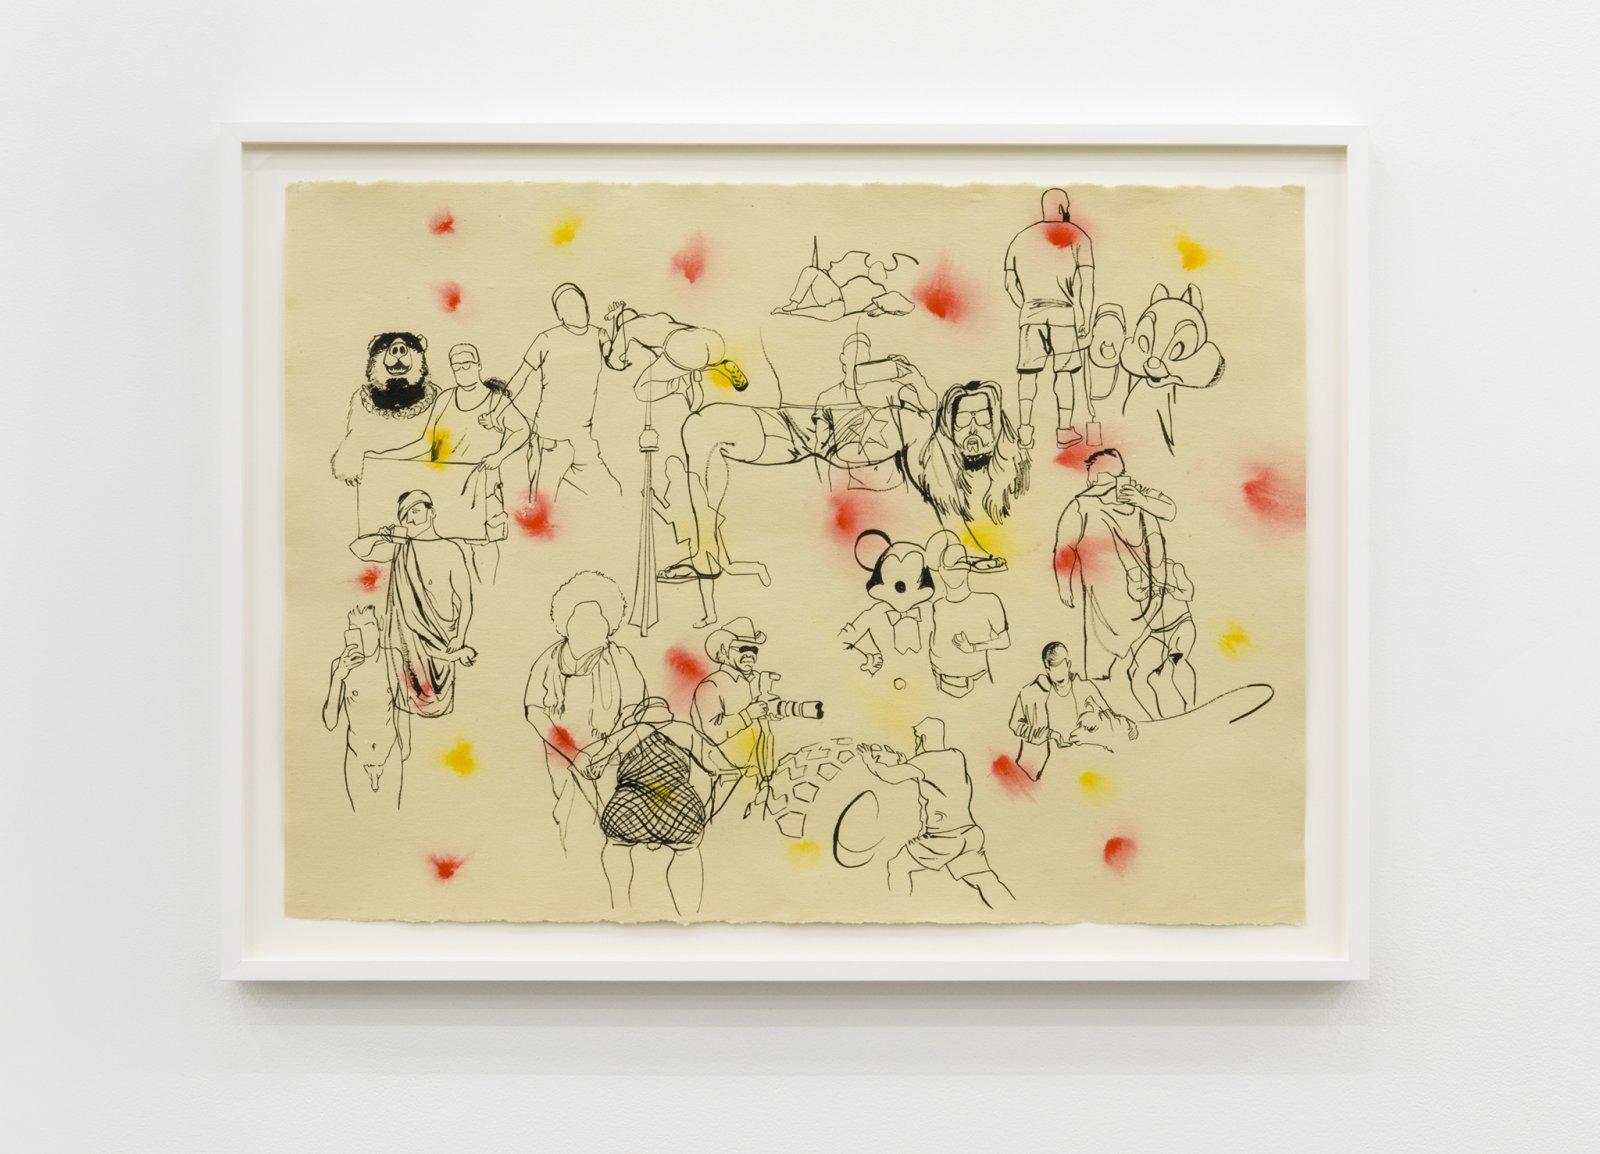 Brian Jungen,Untitled, 2017,felt marker on paper, 21 x 30 in. (52 x 75 cm)